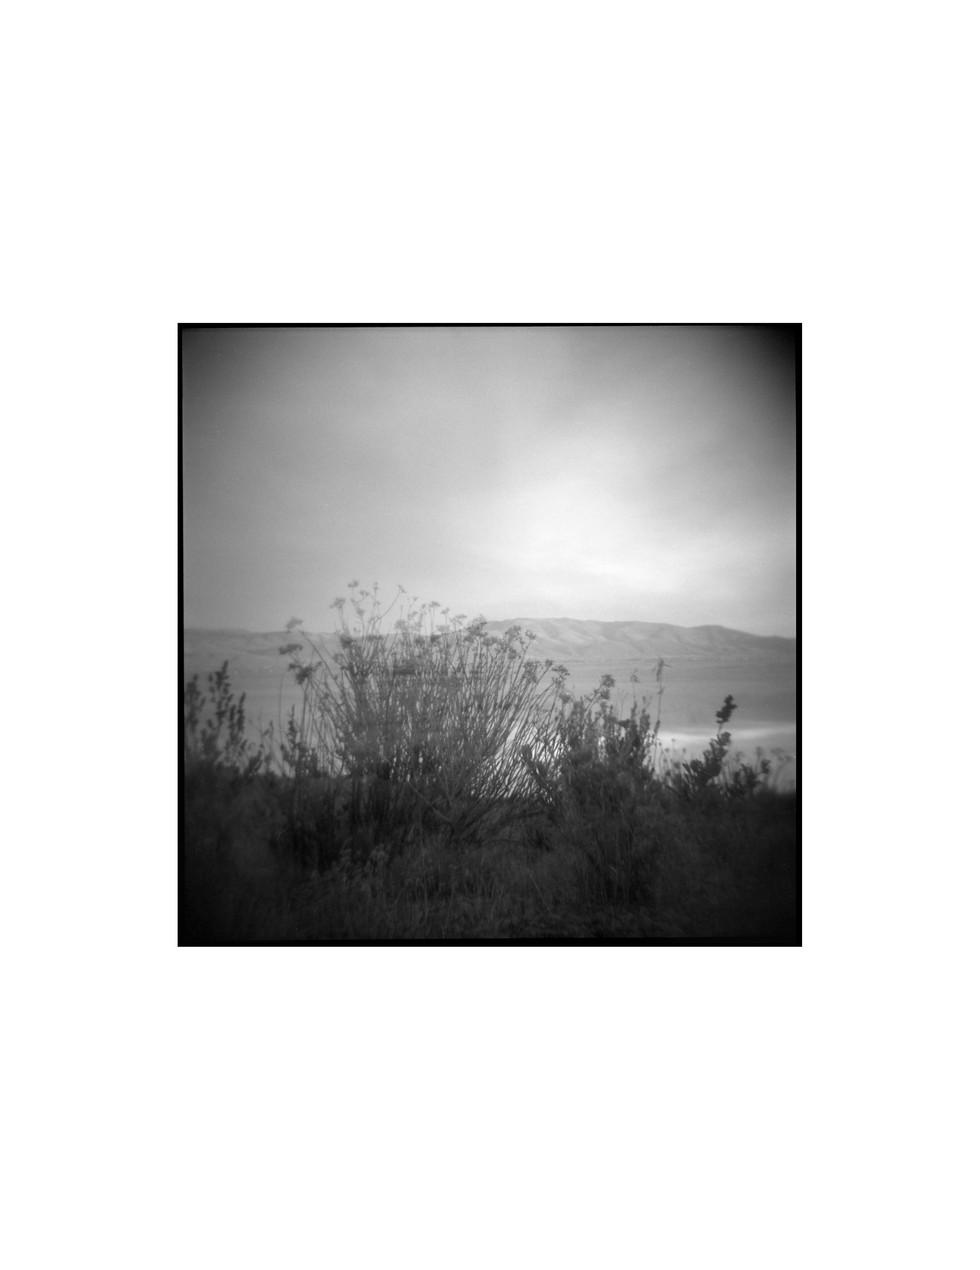 13brushlandscapefinal.jpg